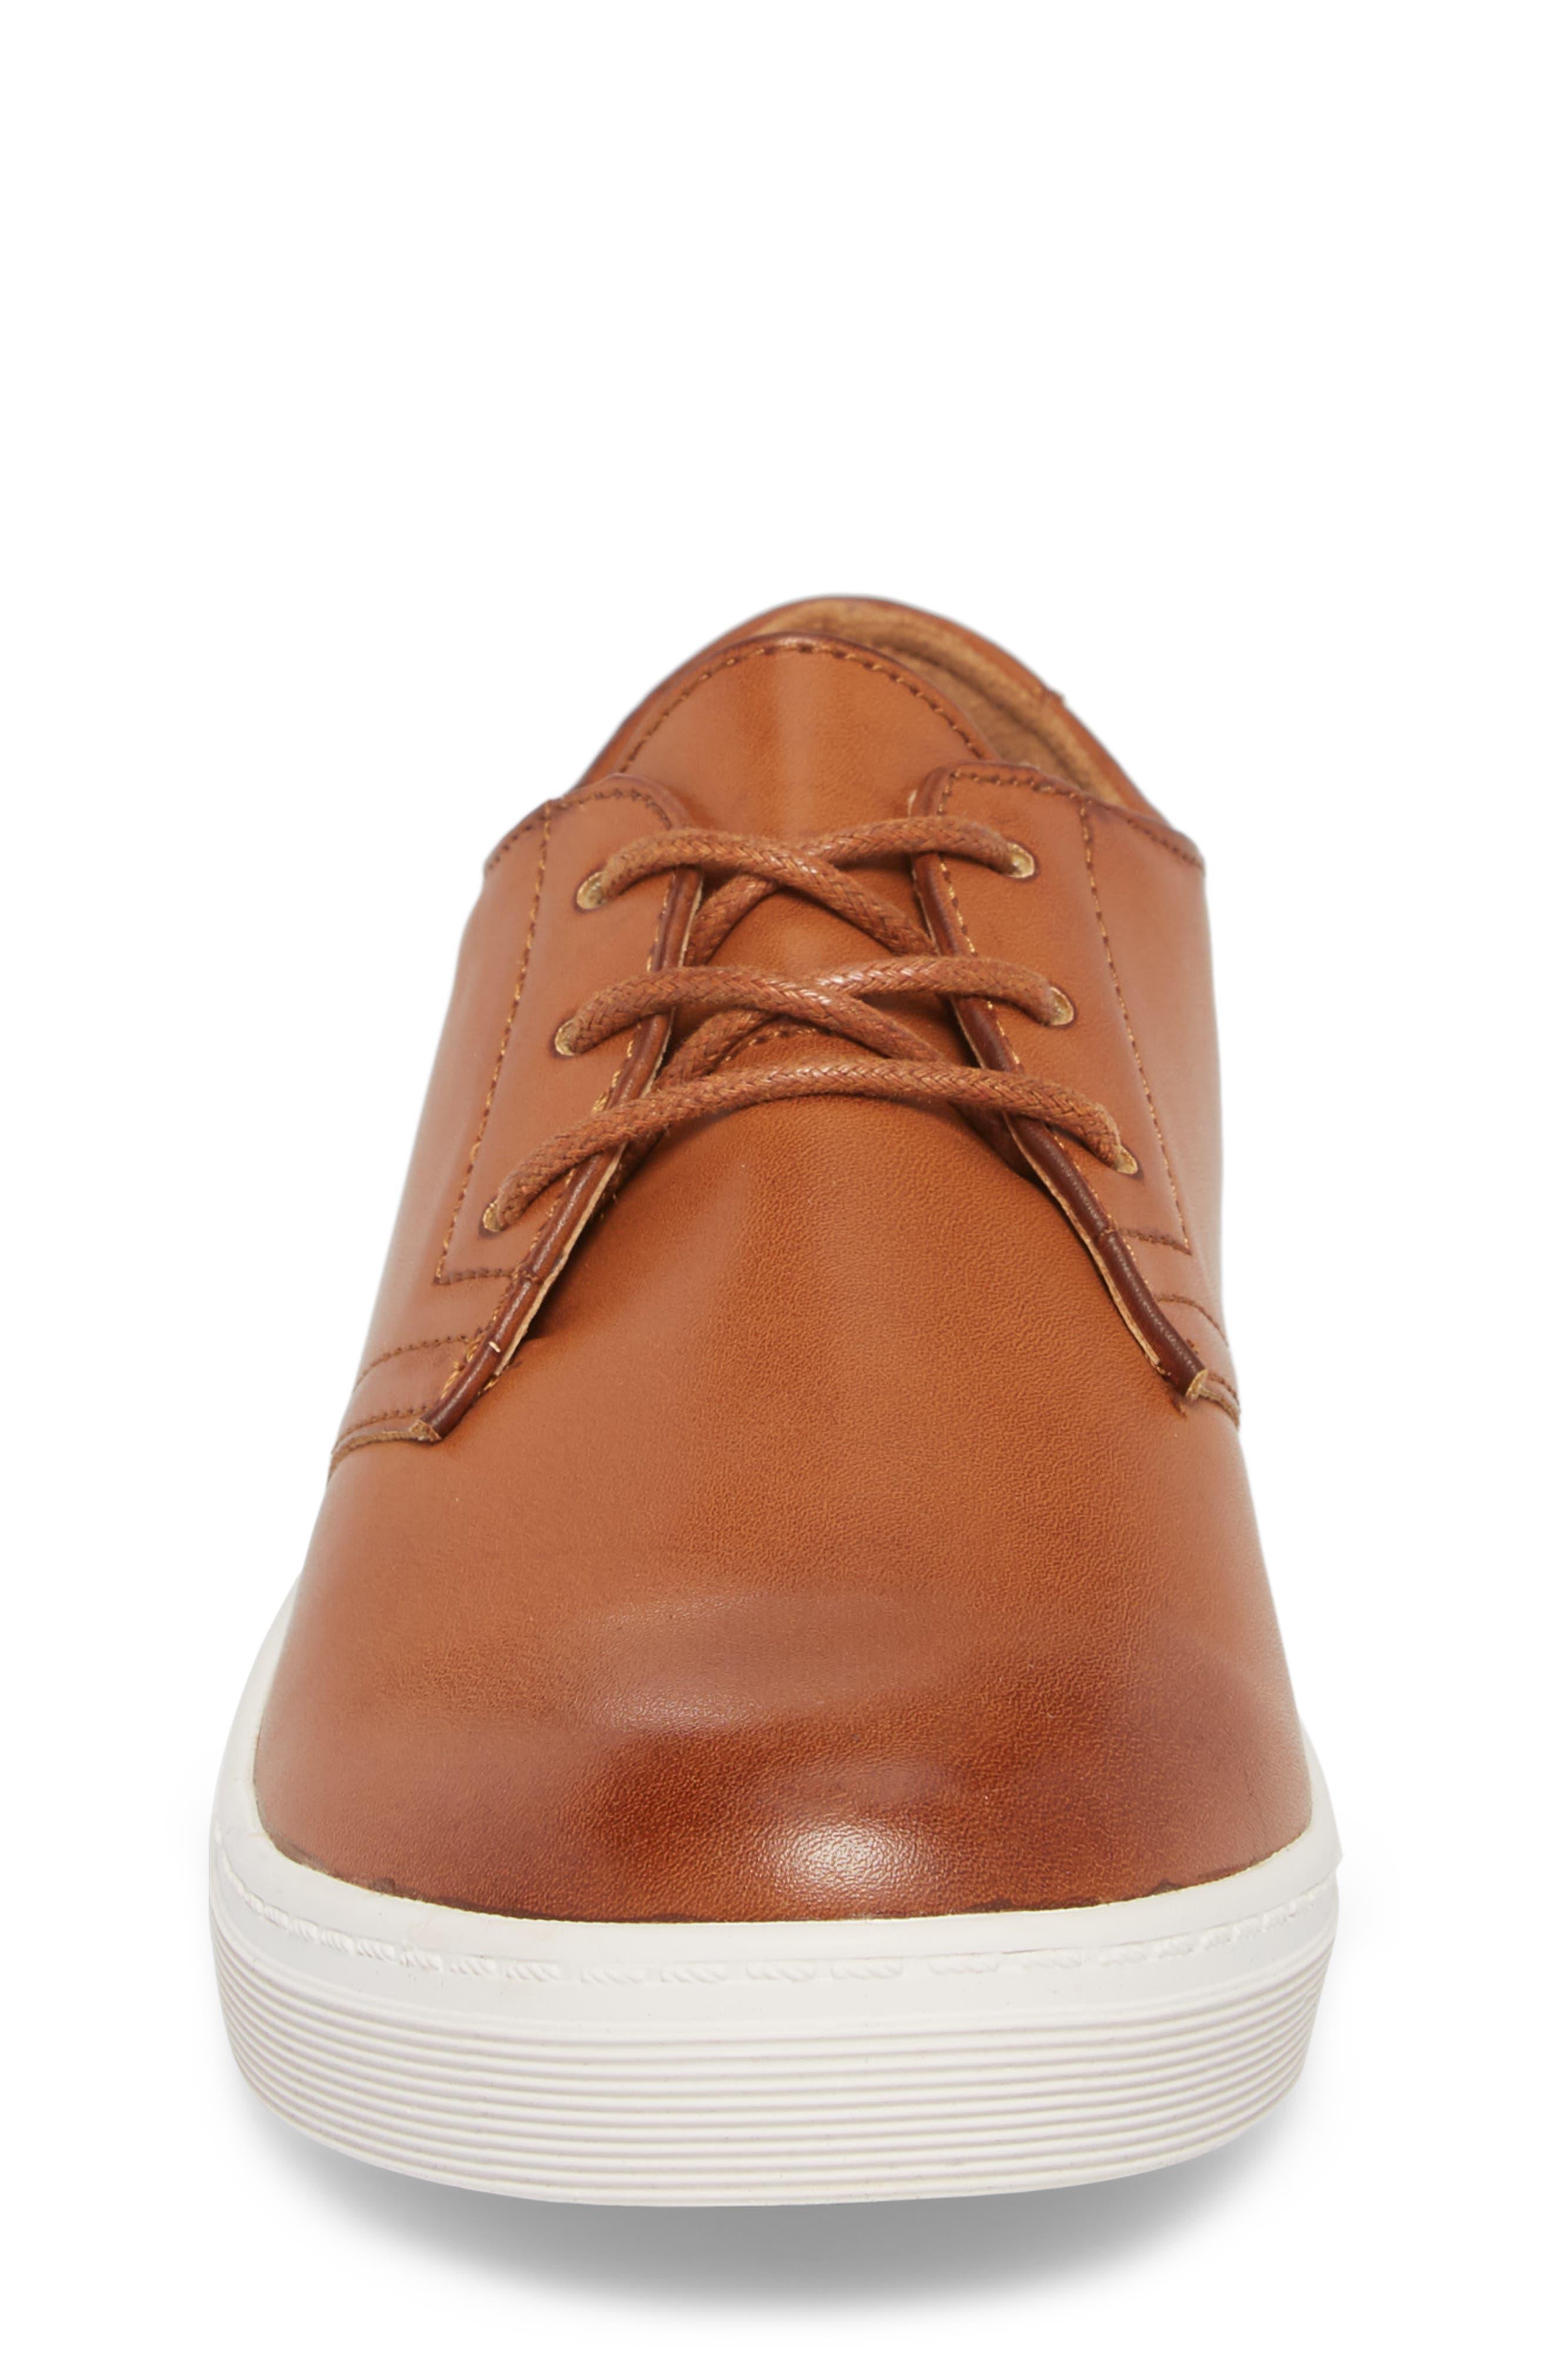 Freeland Sneaker,                             Alternate thumbnail 4, color,                             COGNAC